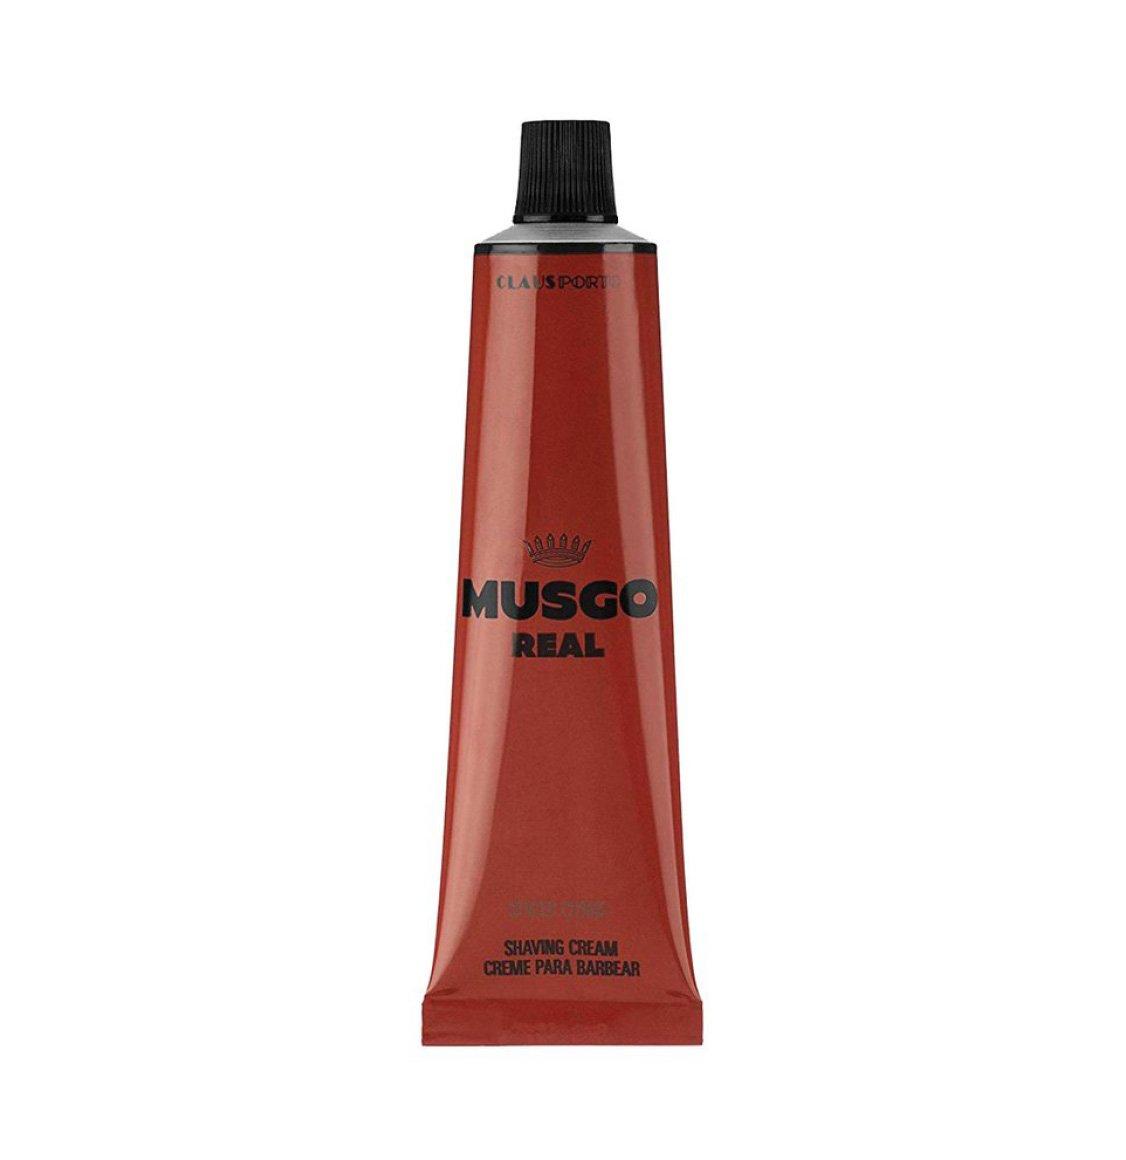 Claus Porto Musgo Real Spiced Citrus Shaving Cream 100ml